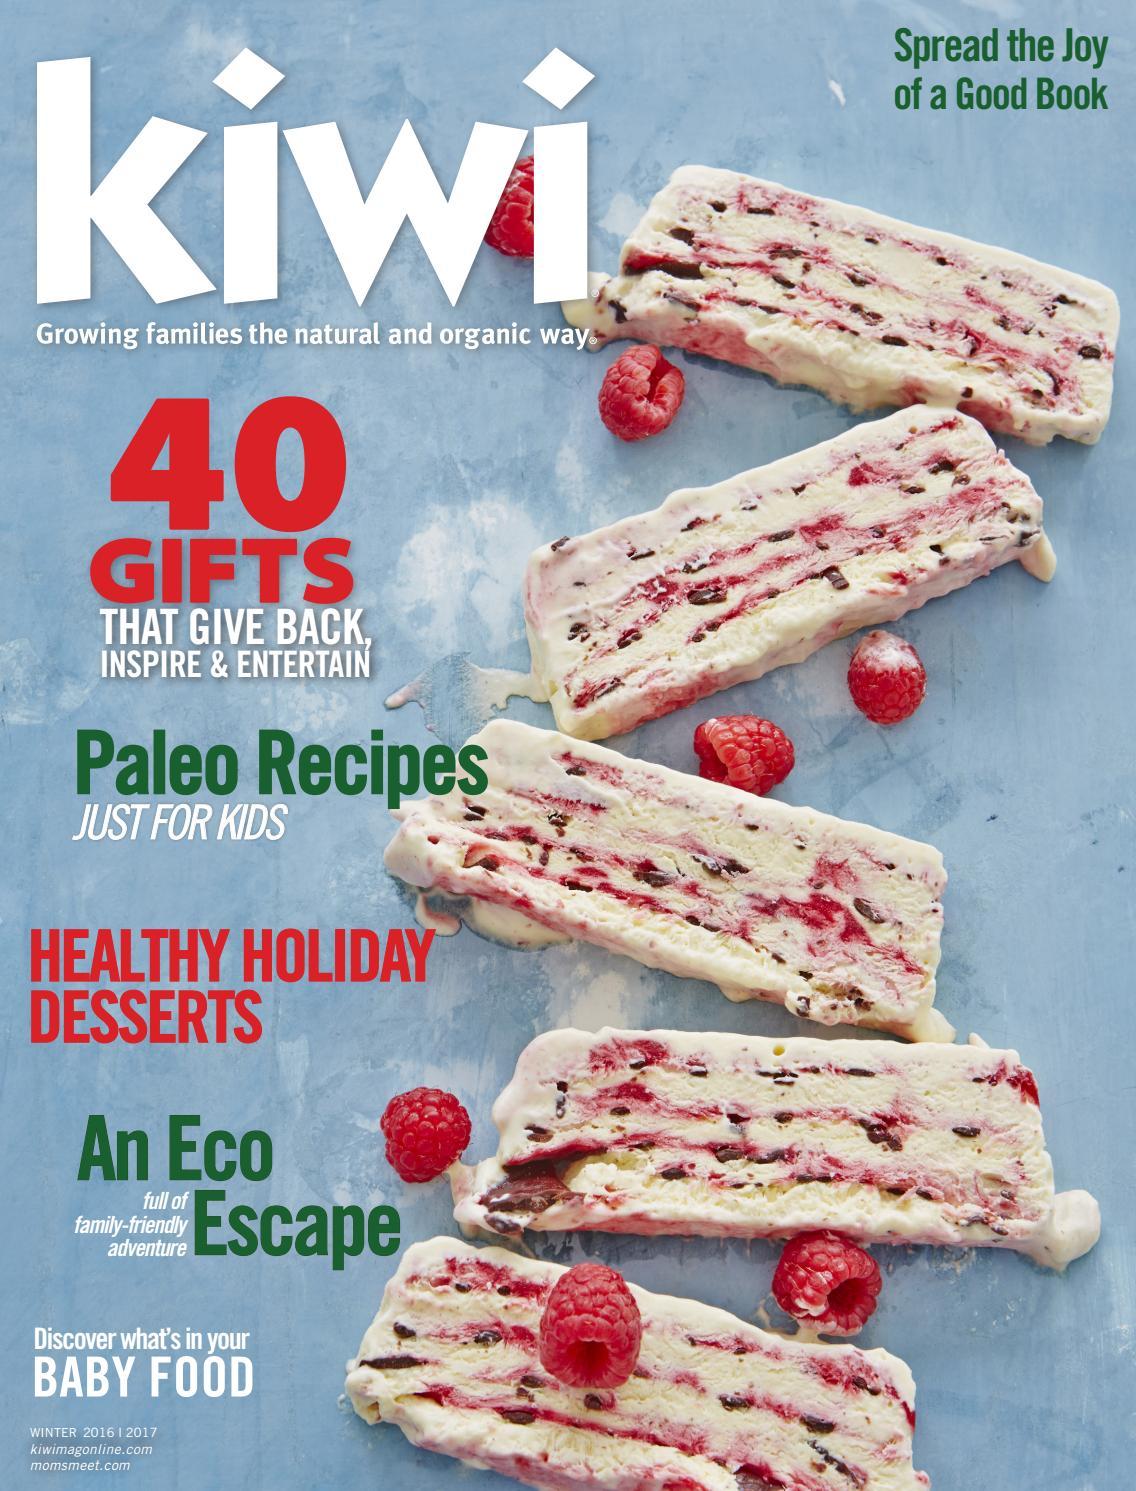 KIWI magazine - Winter 2016 | 2017 by May Media - issuu